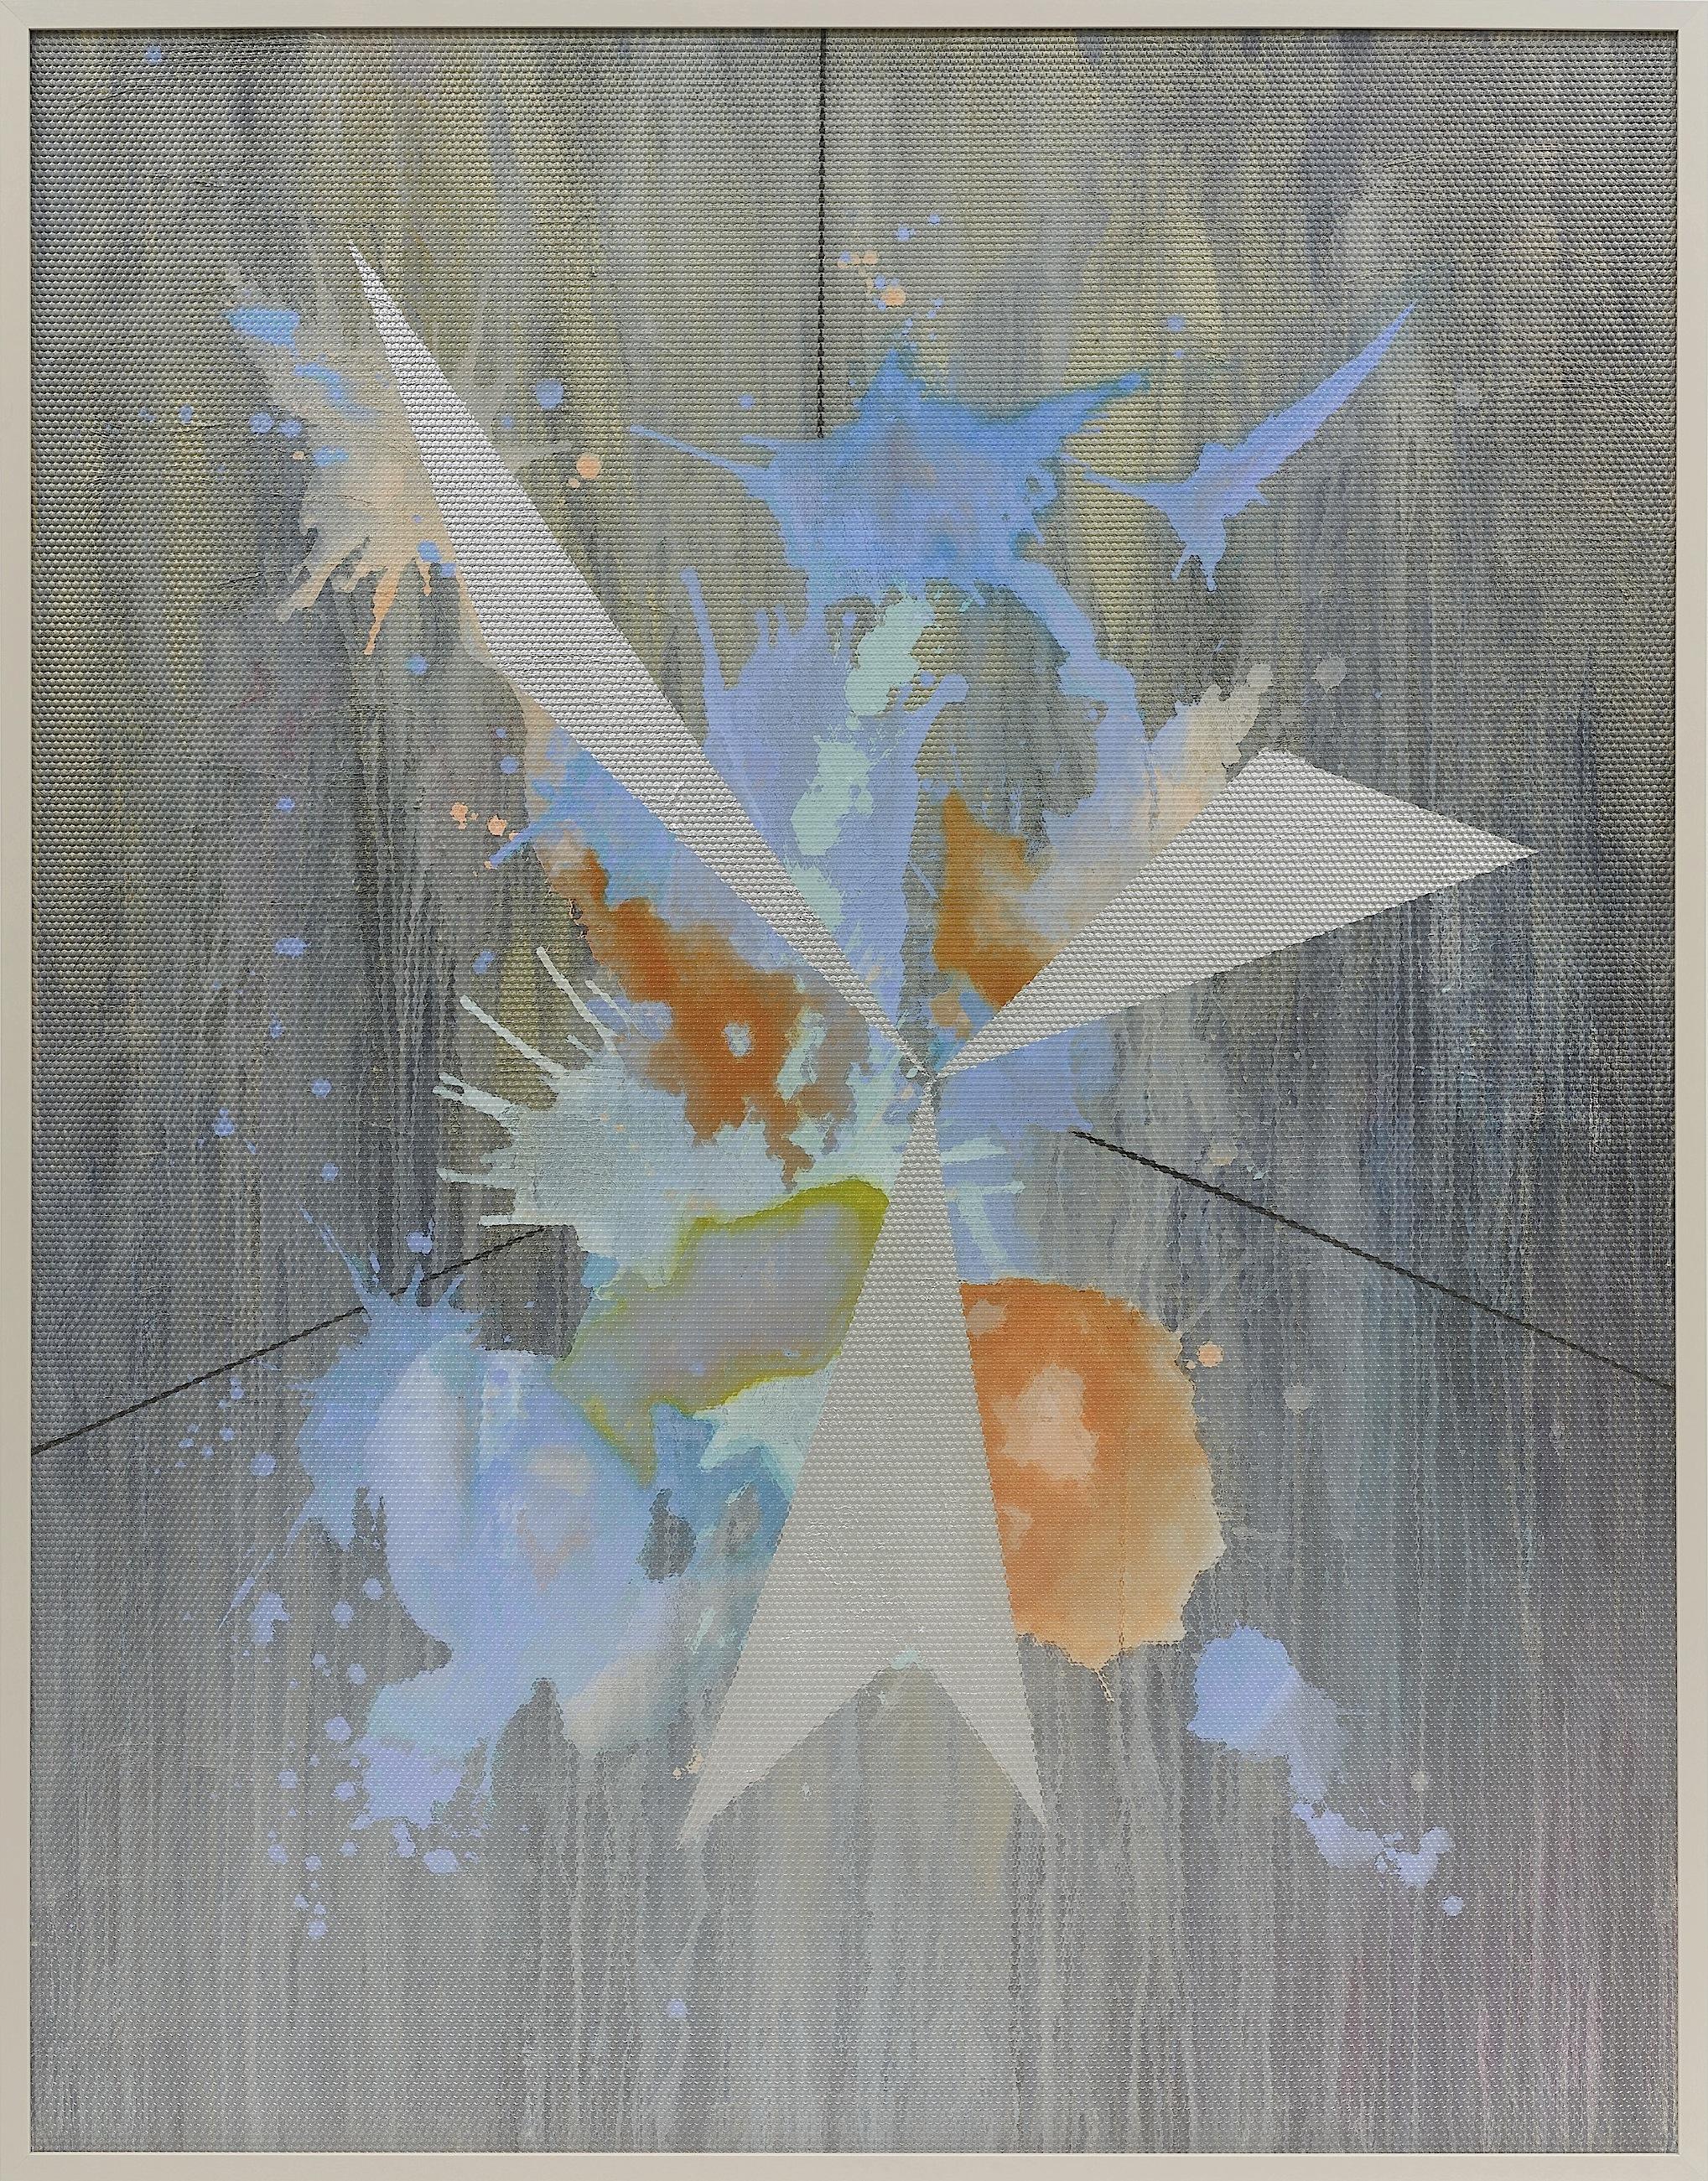 Eidolon / Part III,  2012 Oil and acrylic on canvas beneath textured Plexiglas 180 x 140 cm (71 x 55 in)